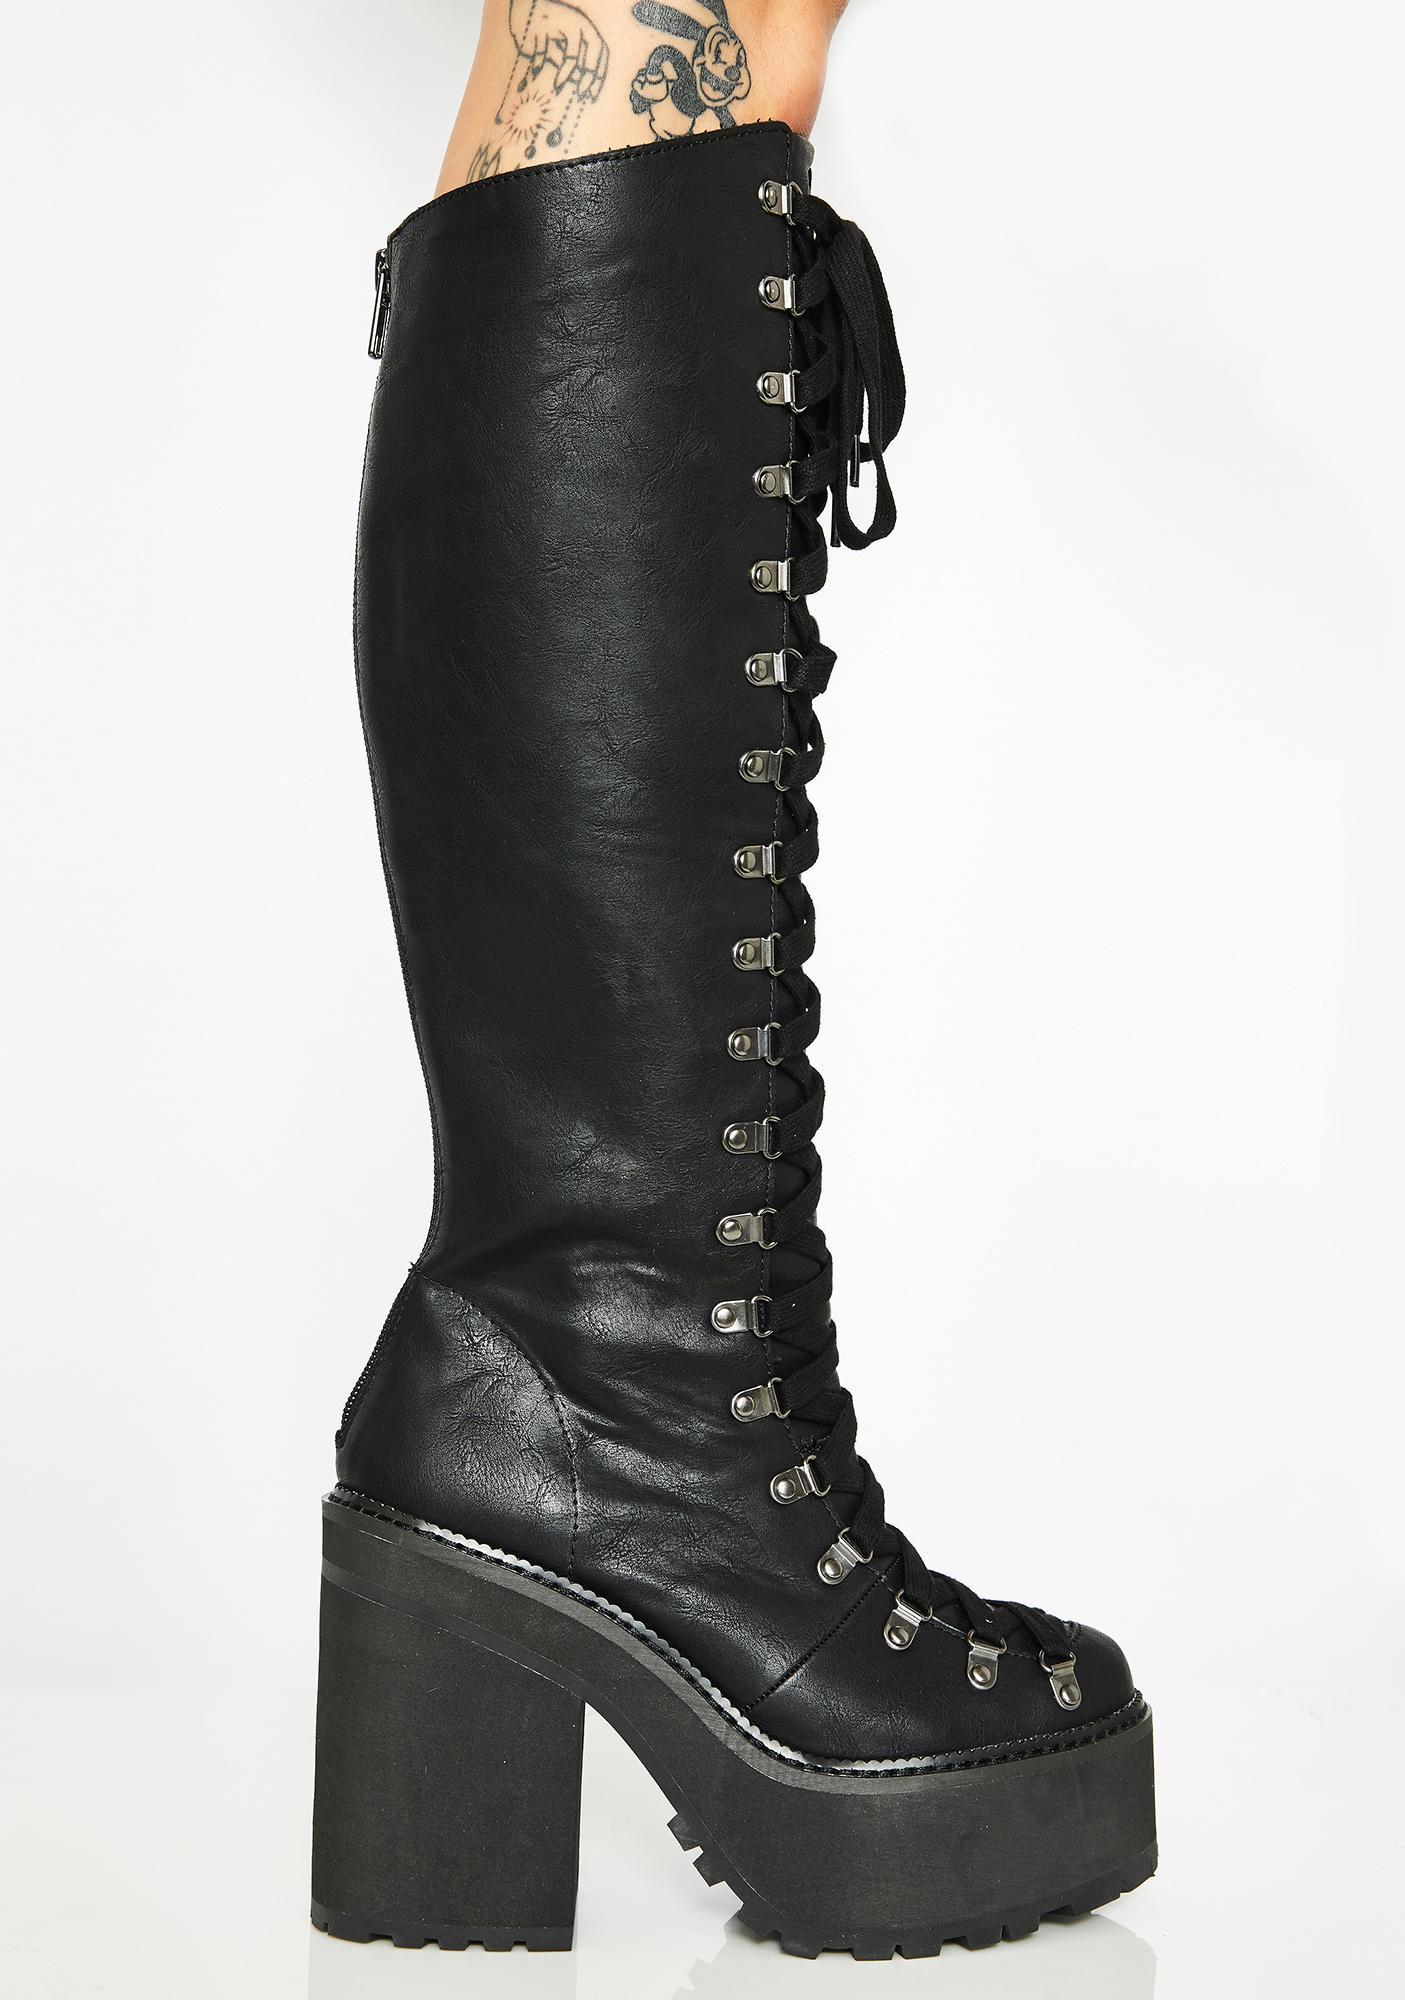 Killstar Bloodletting Knee High Boots